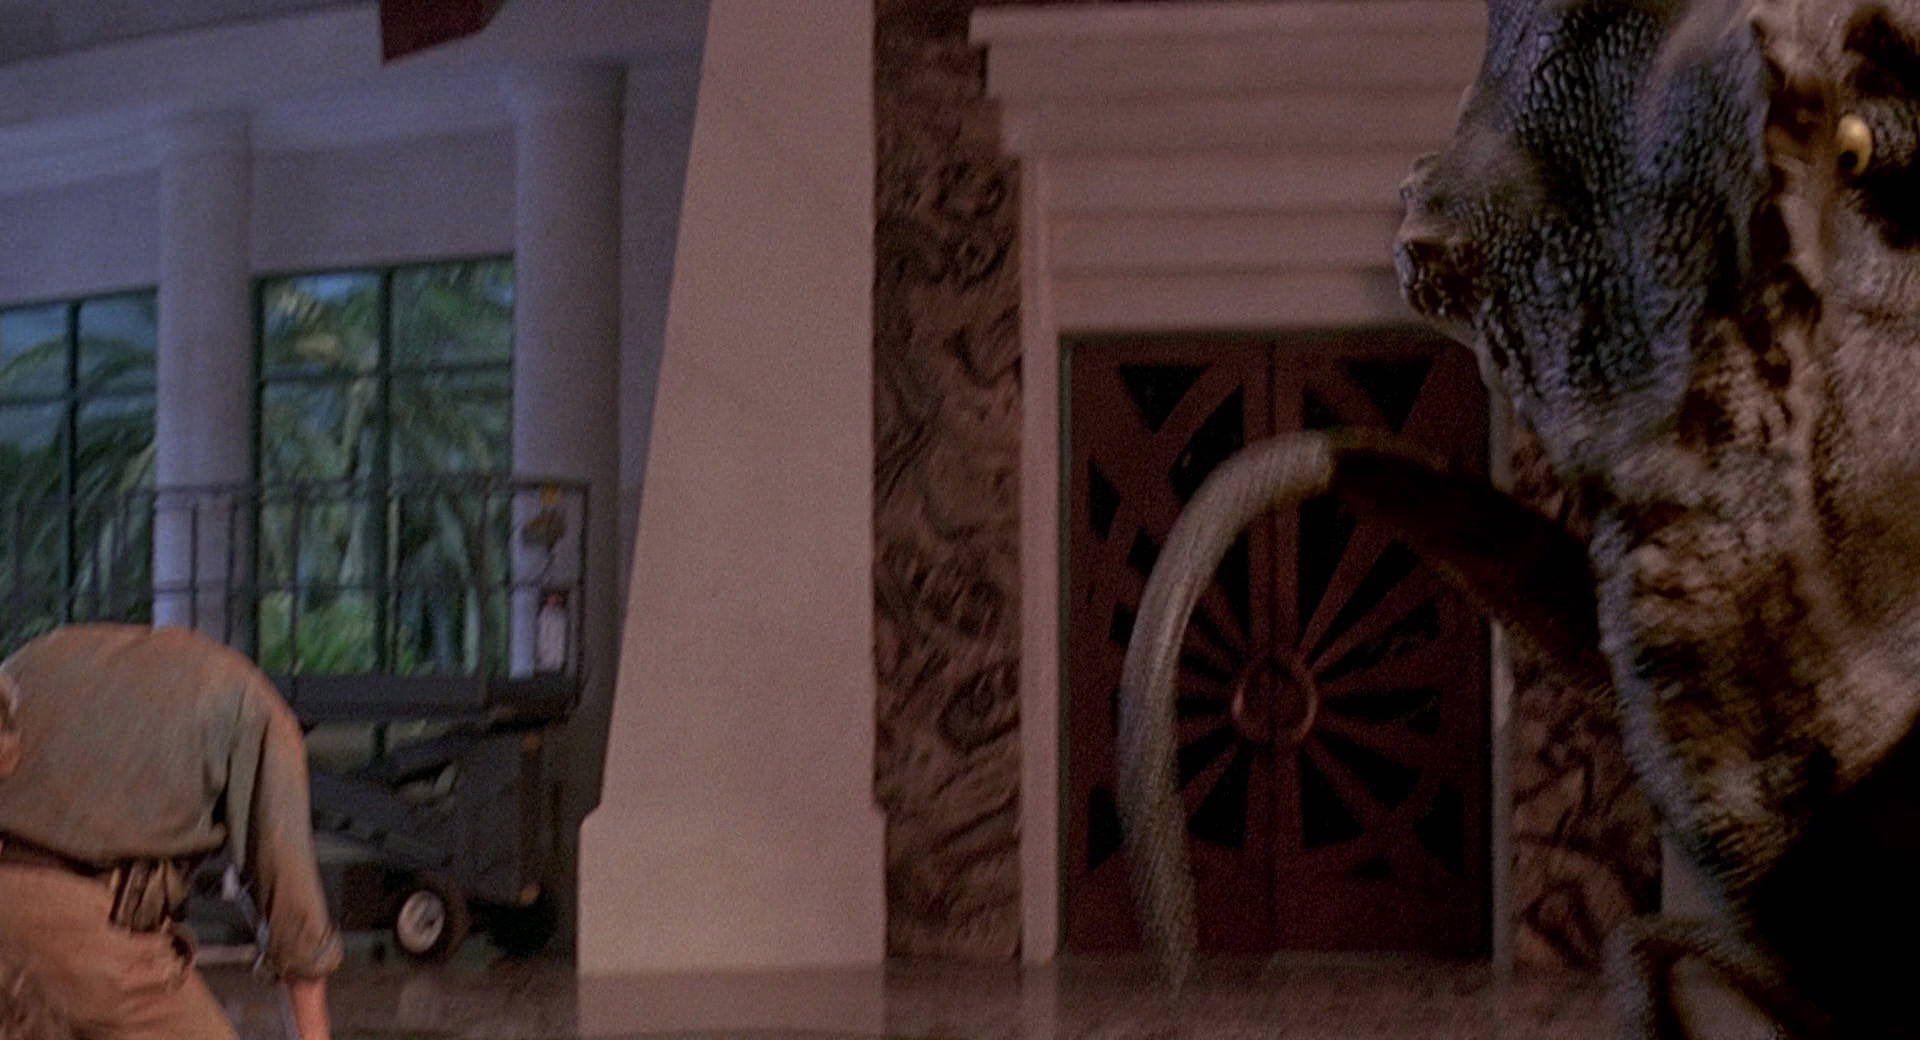 Pin by My Stuff on No Way! | Jurassic park trailer, Small ...  |Jurassic Park Interior Design